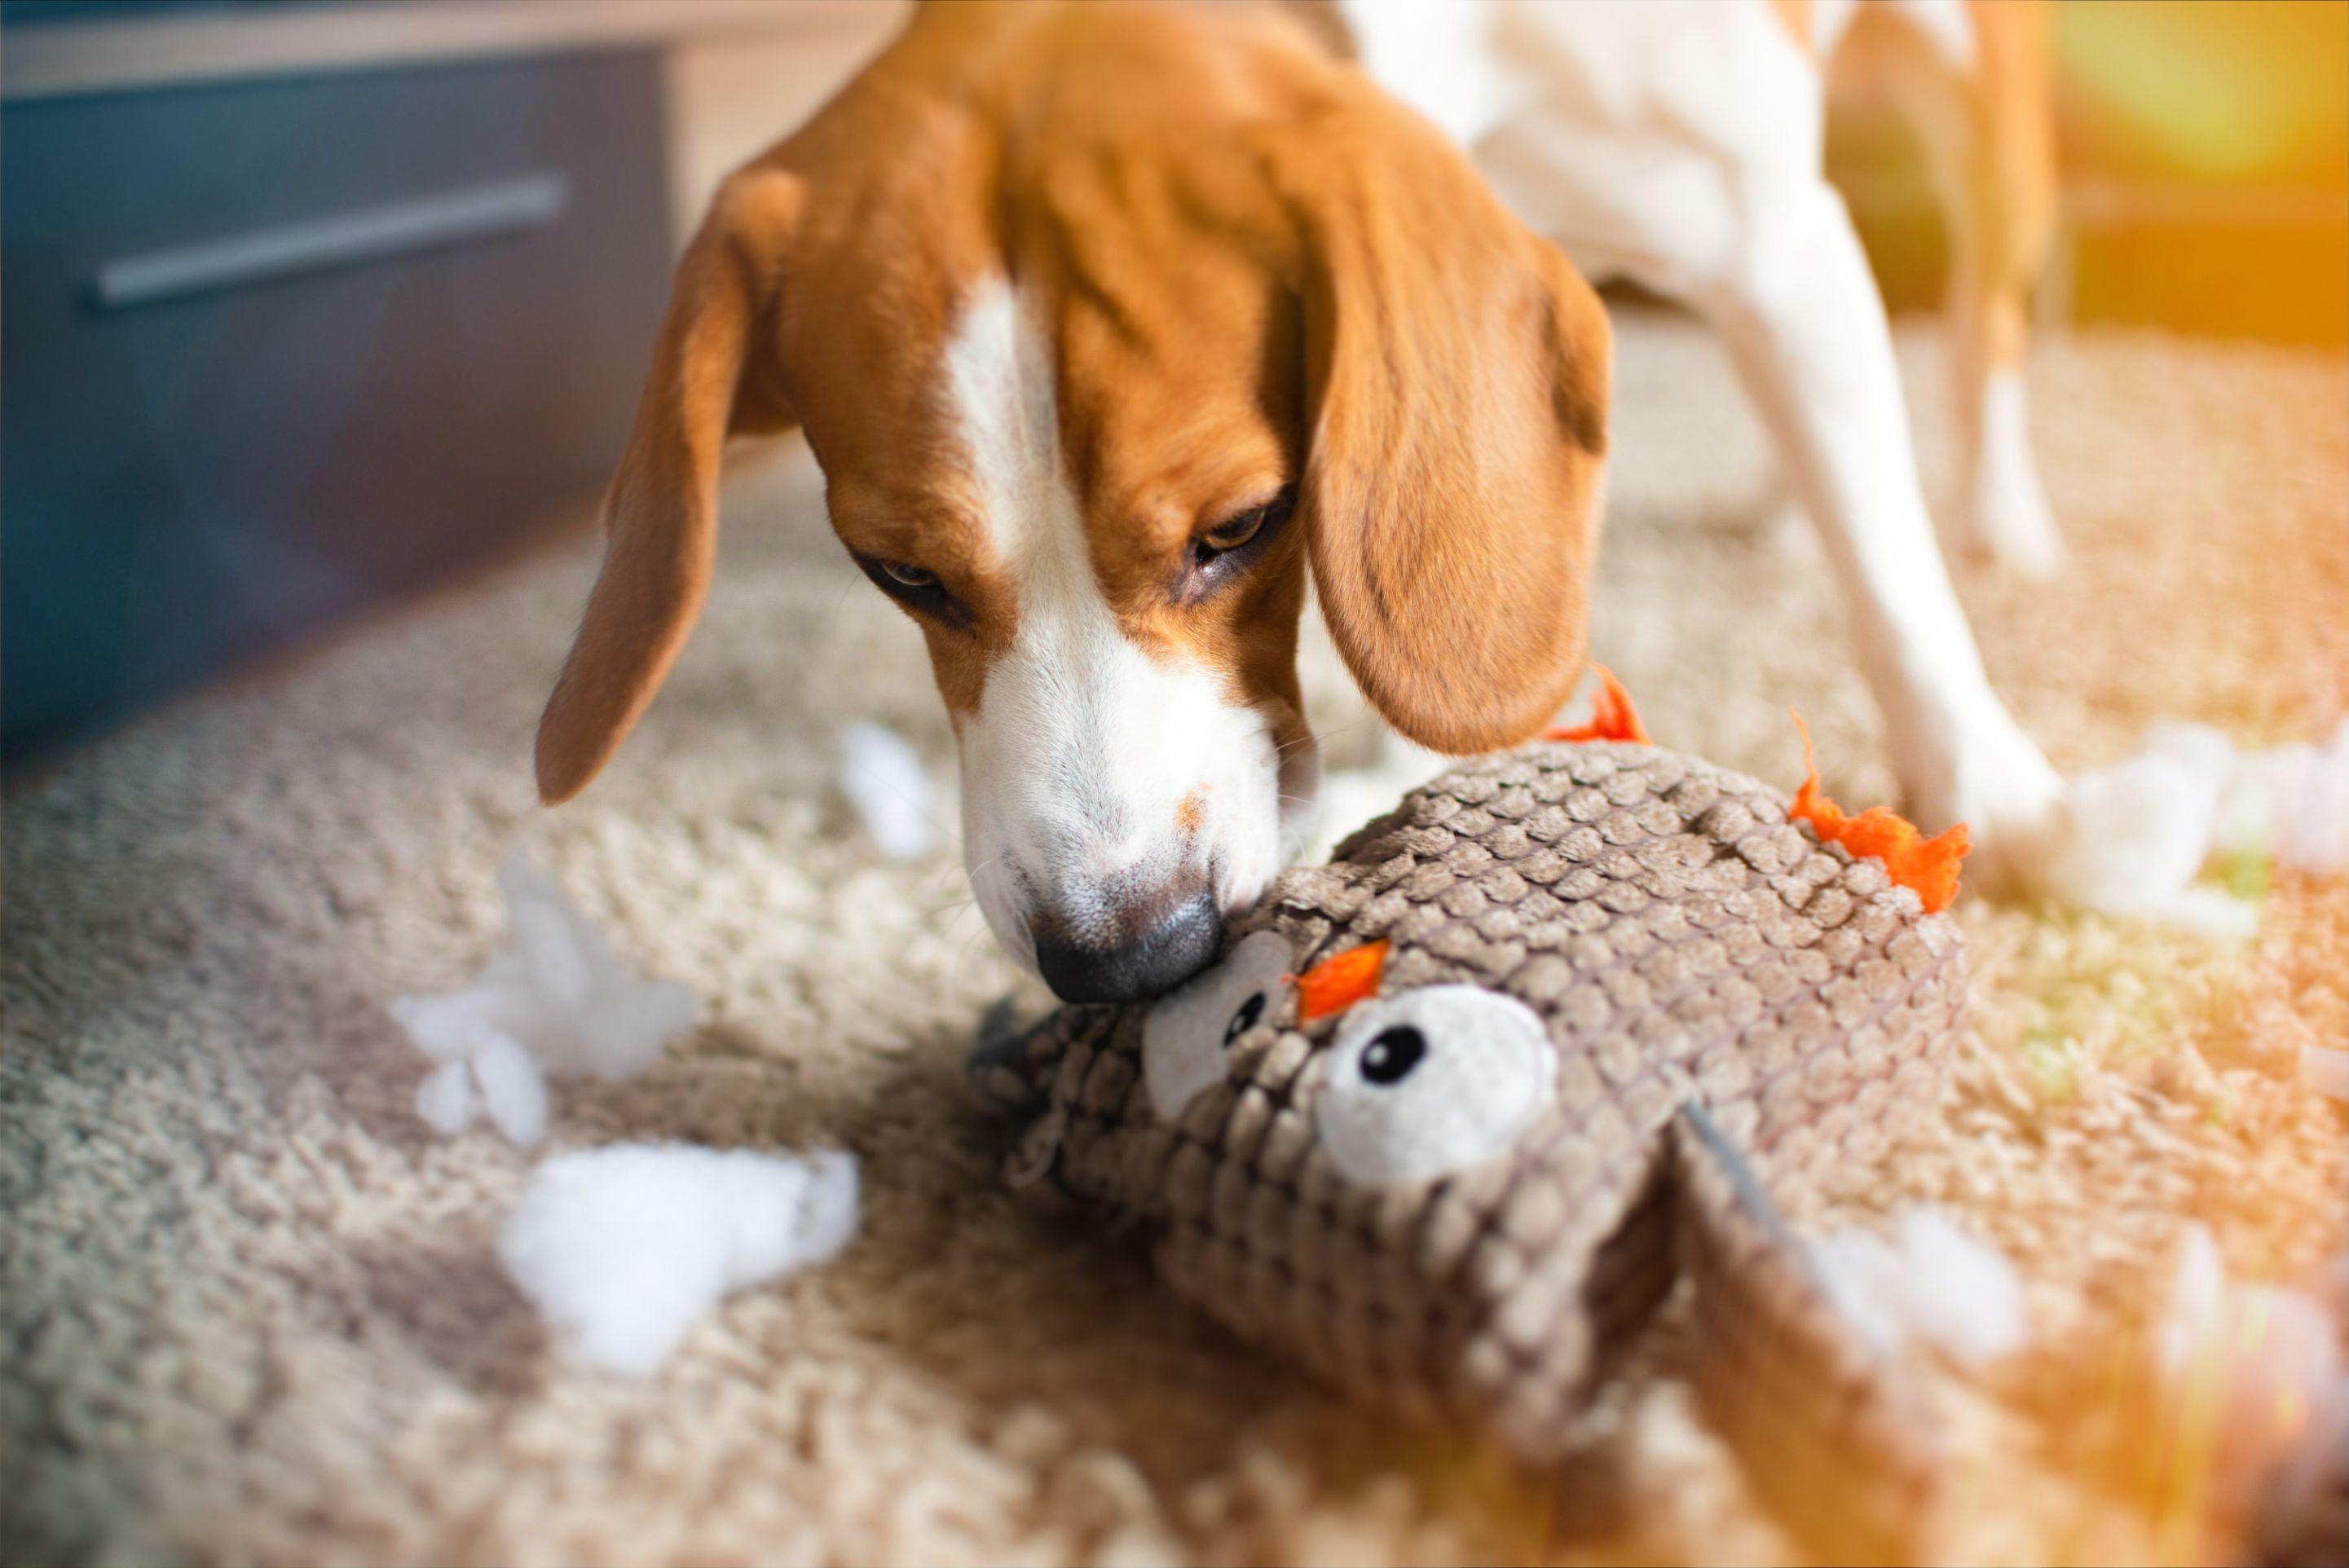 dog sniffing toy